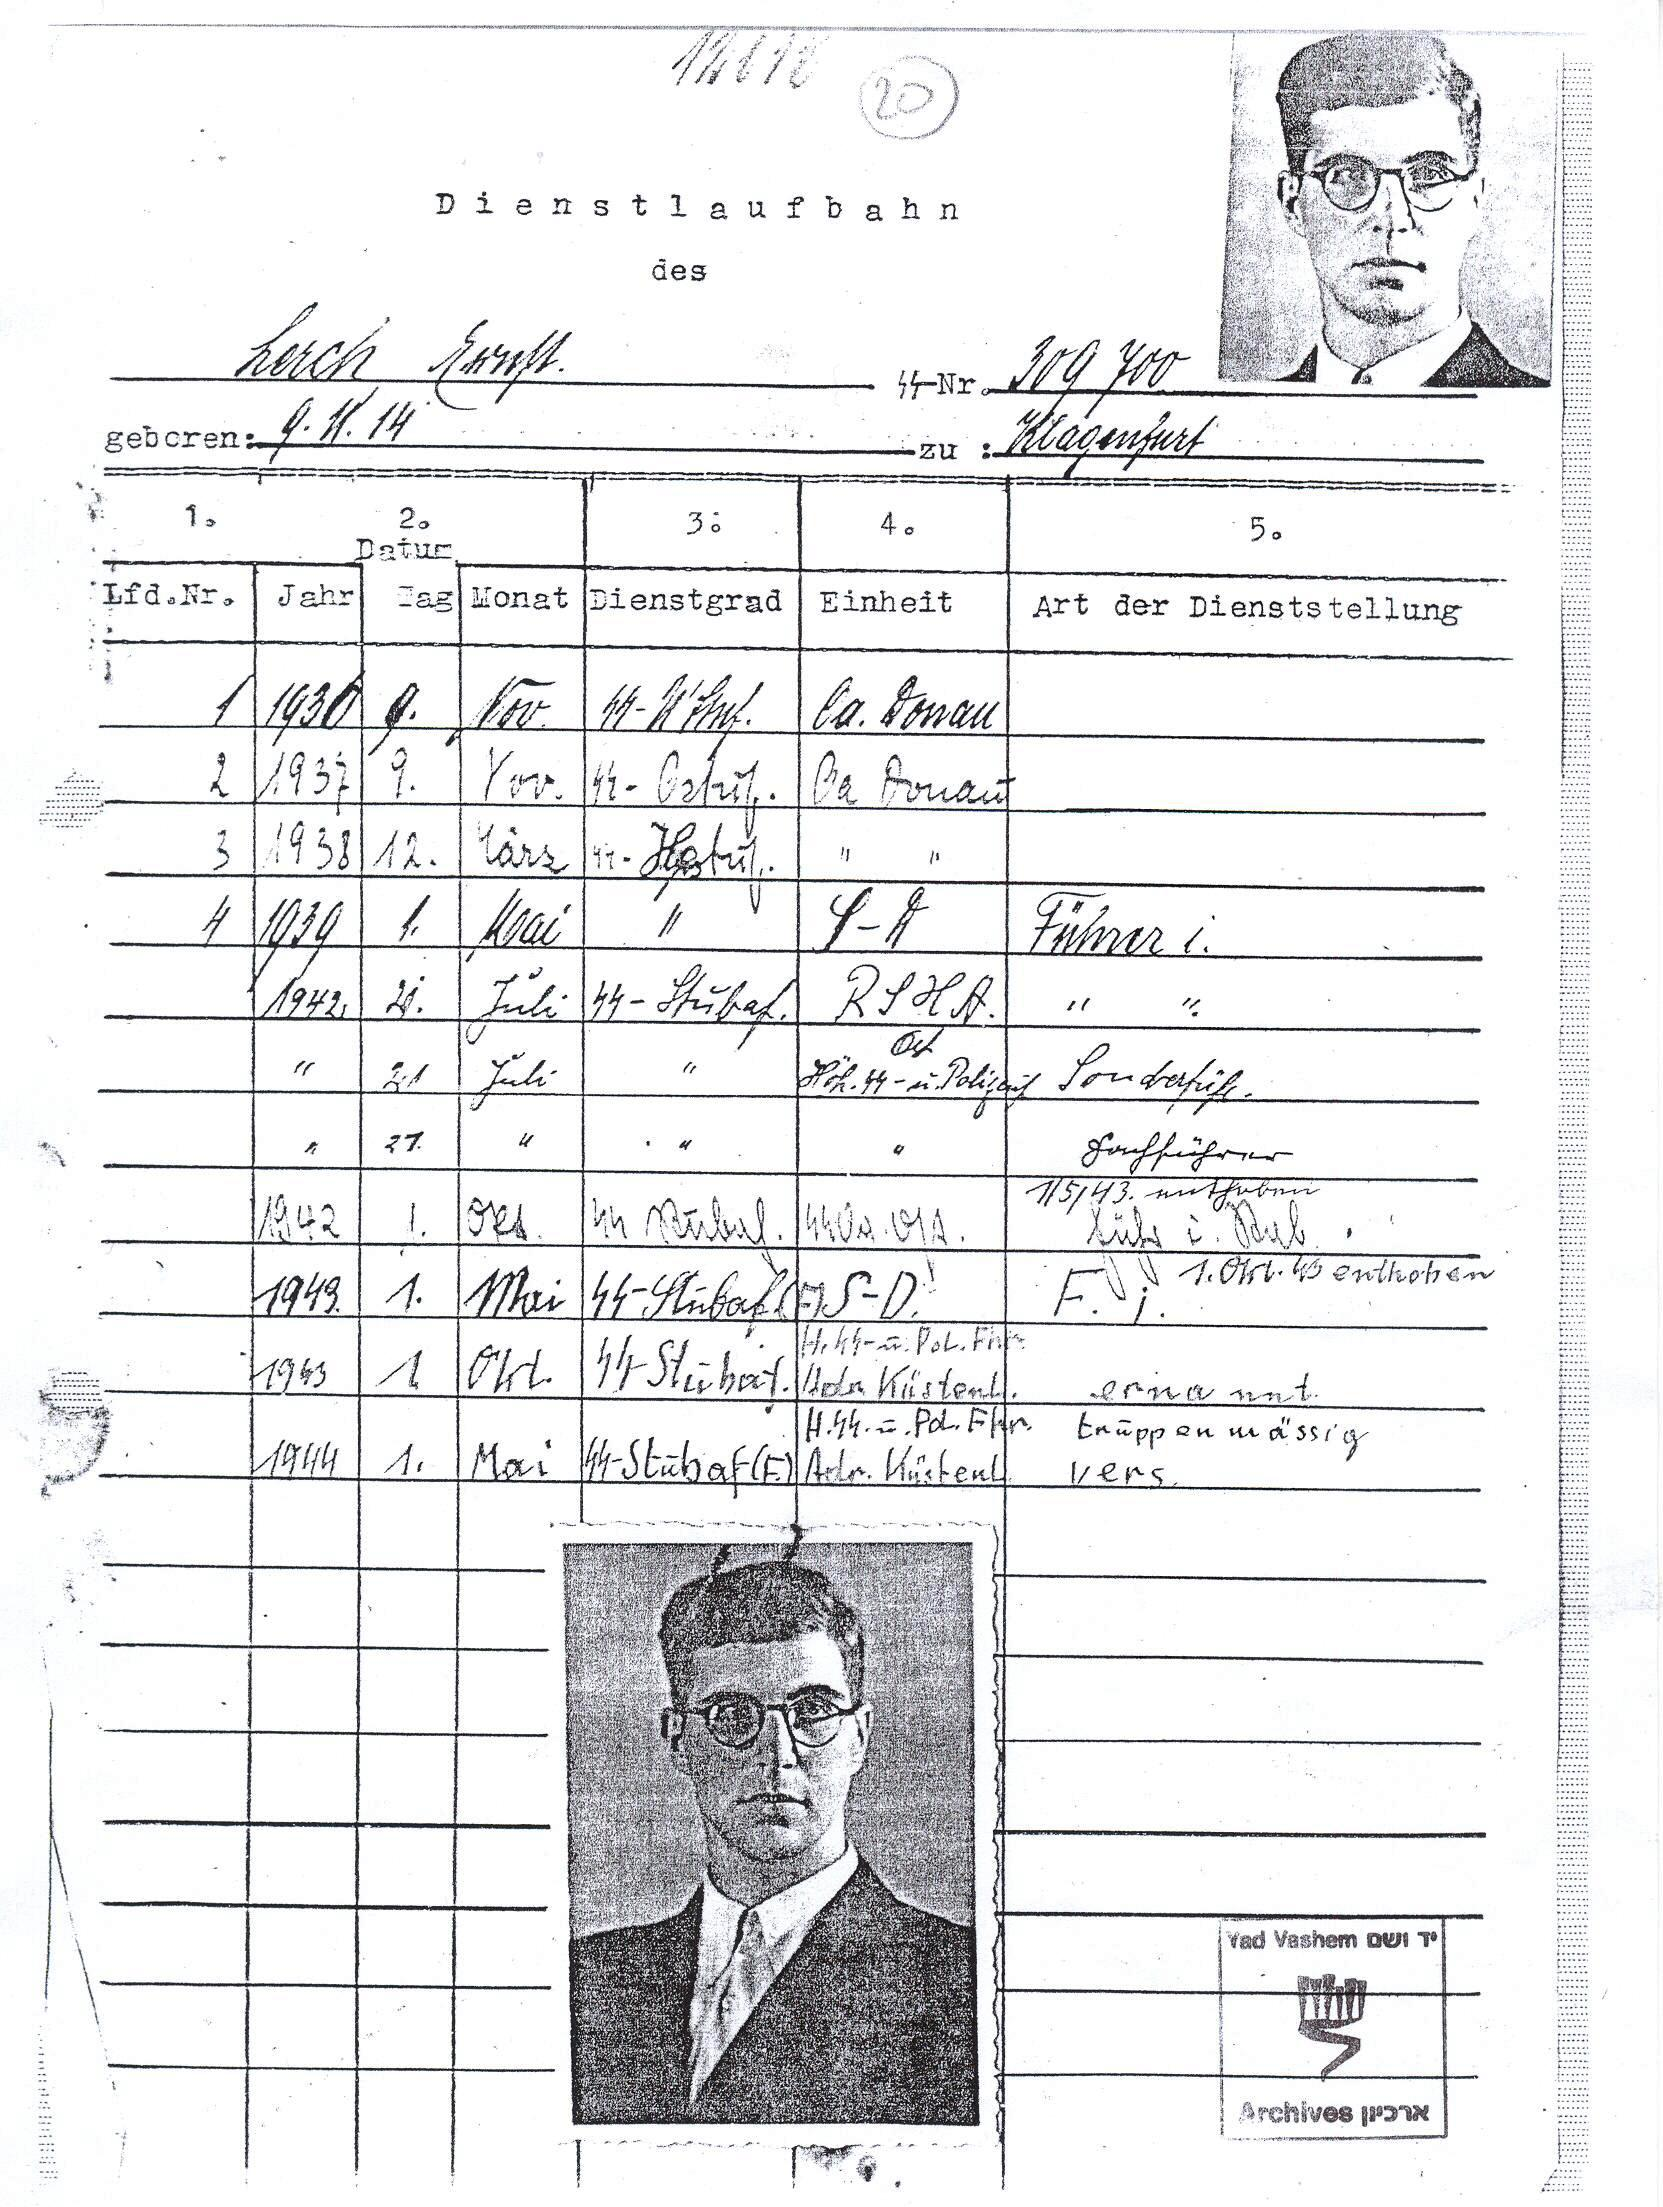 Ernst Lerch www.HolocaustResearchProject.org